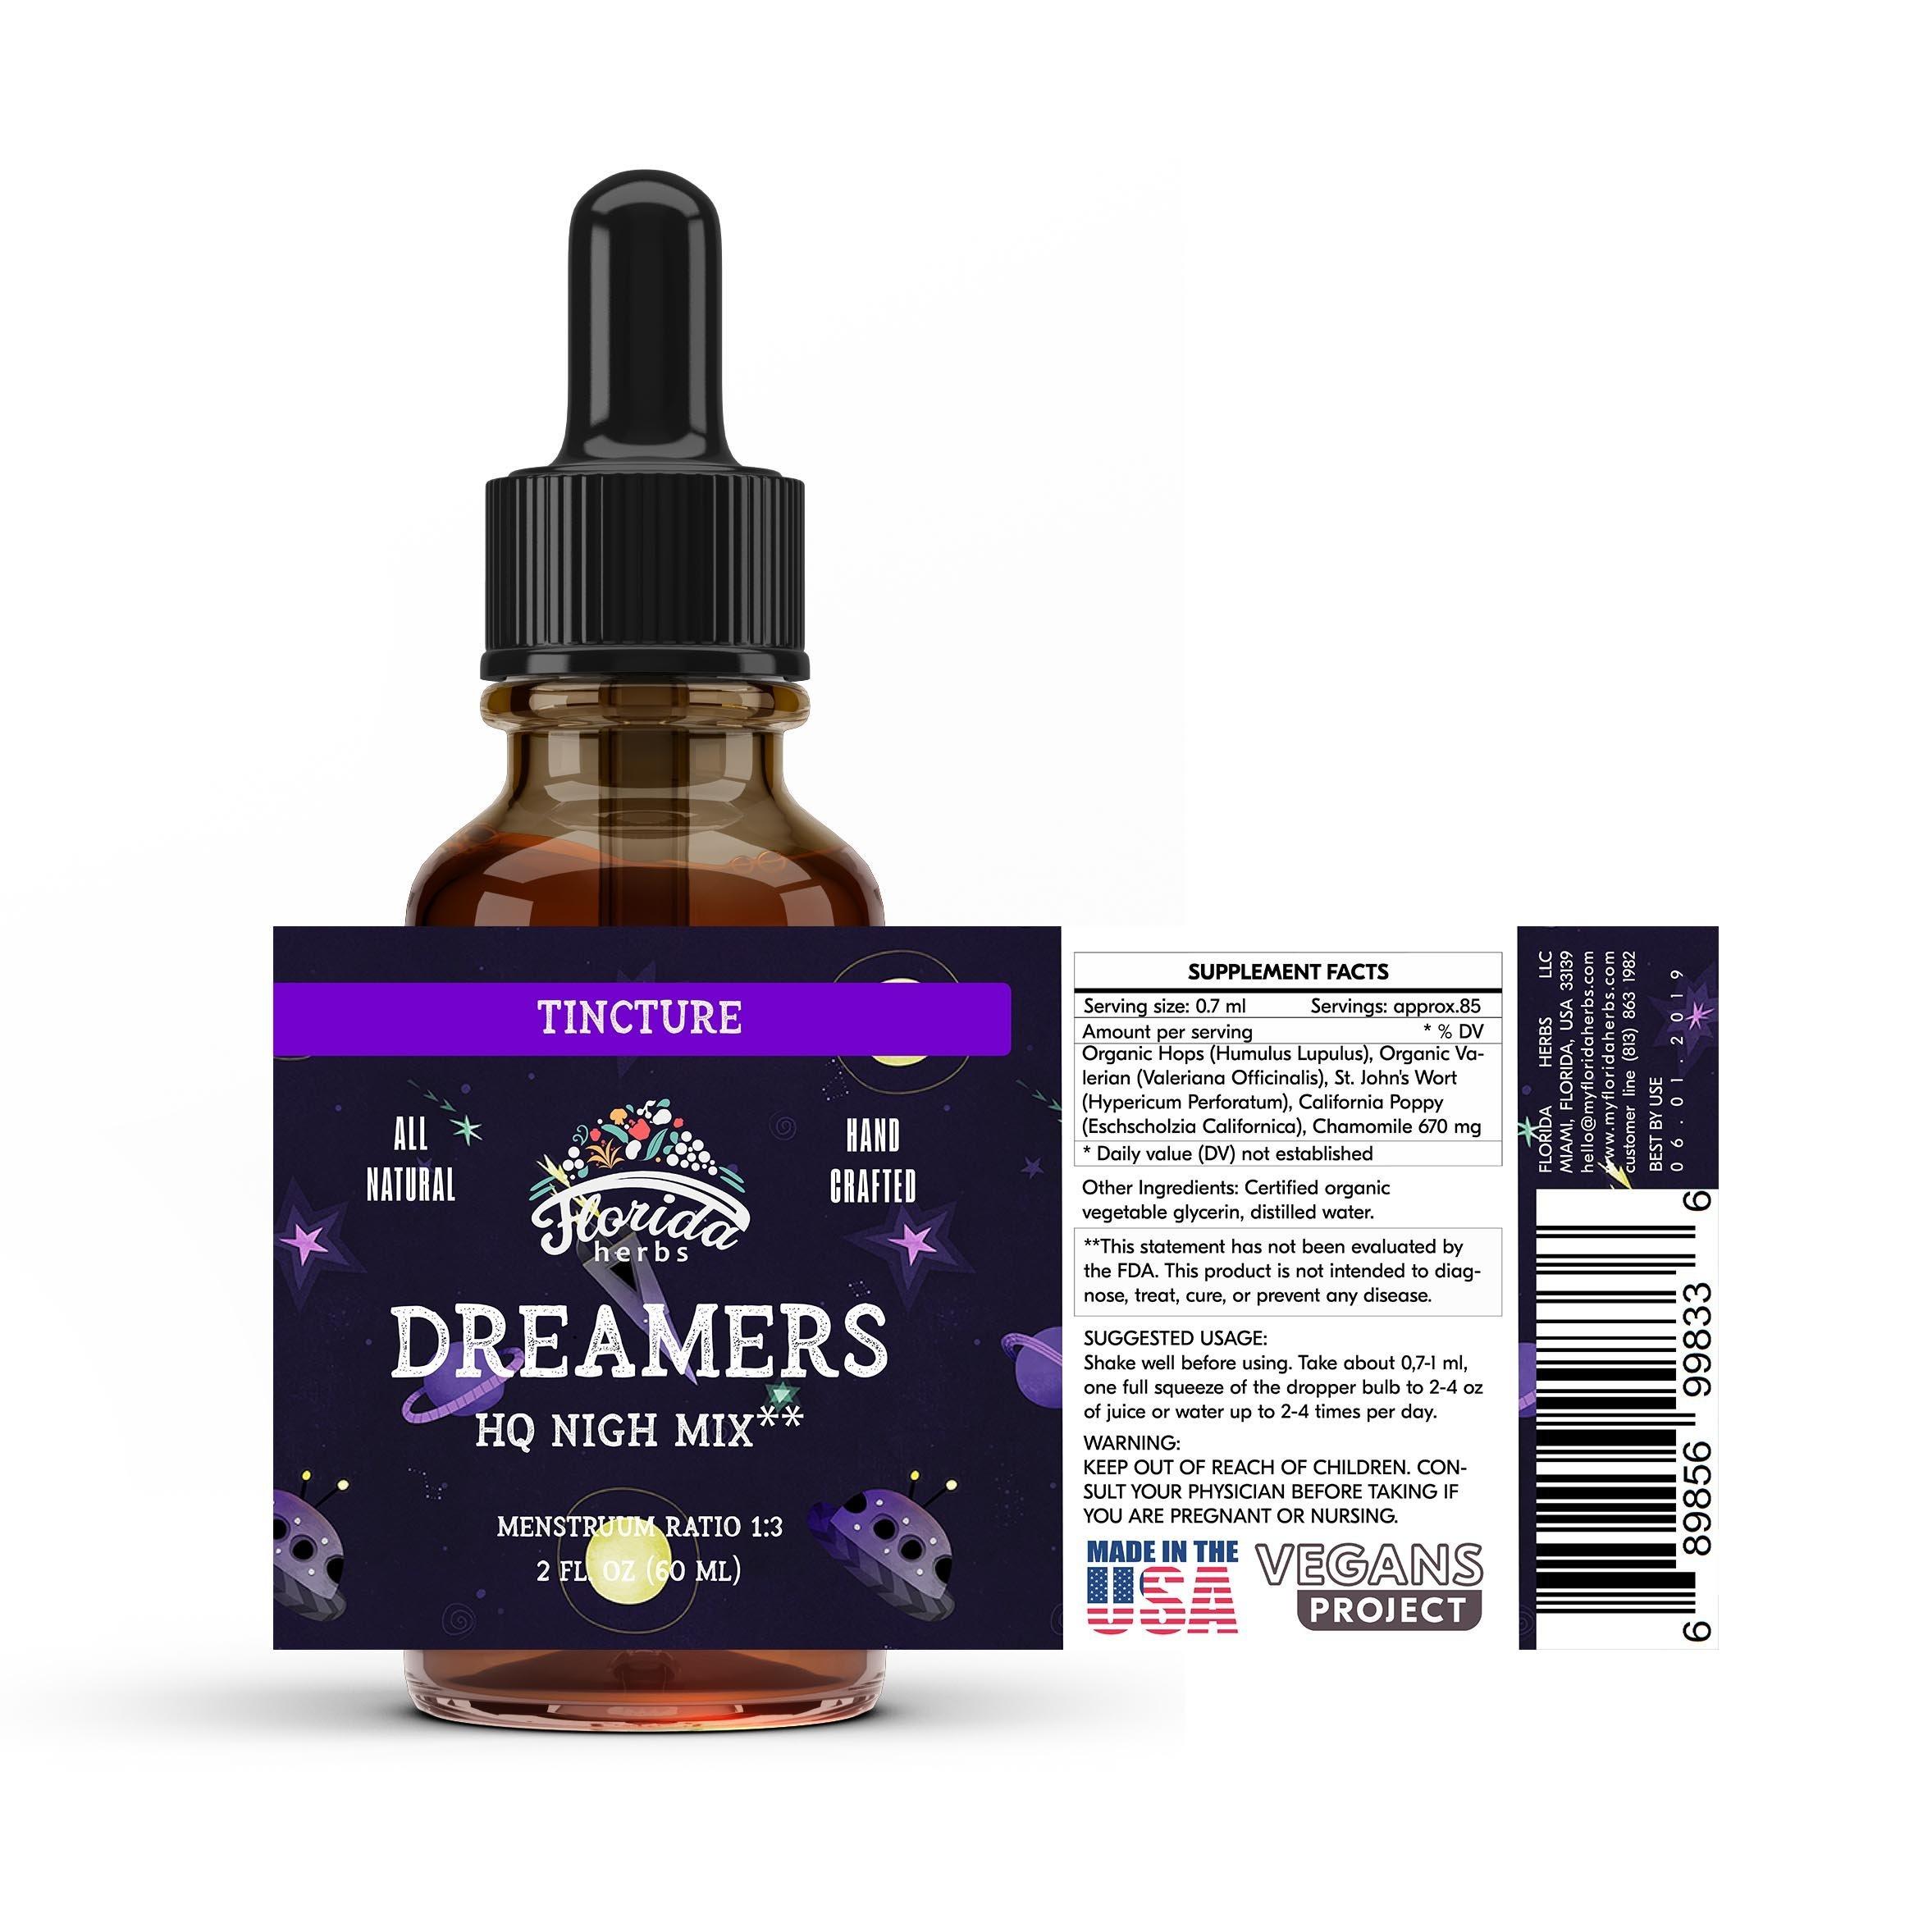 Dream Care Tincture (Organic Hops, Organic Valeriana) Sleep Nighttime Extract by Florida Herbs (Image #2)